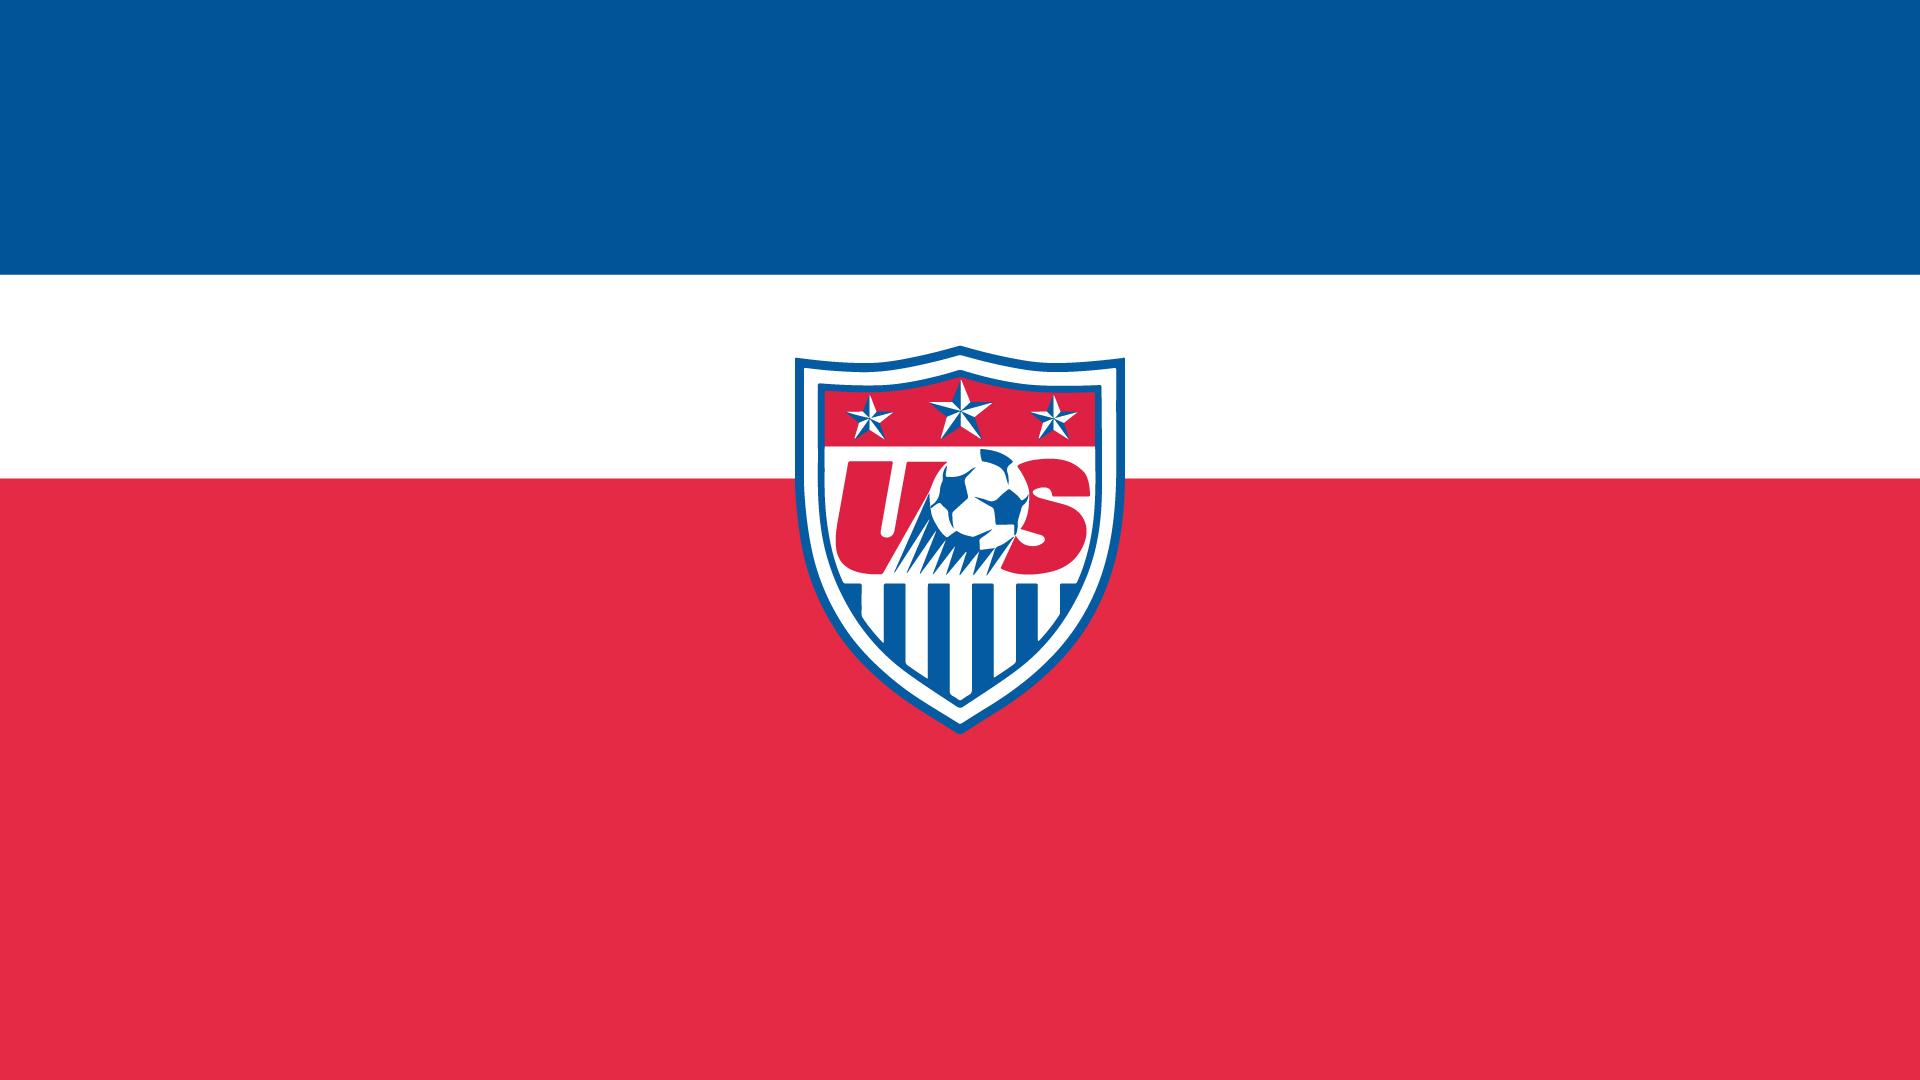 Usa soccer kansas city usa soccer betting sites usa soccer ranking usa 1920x1080